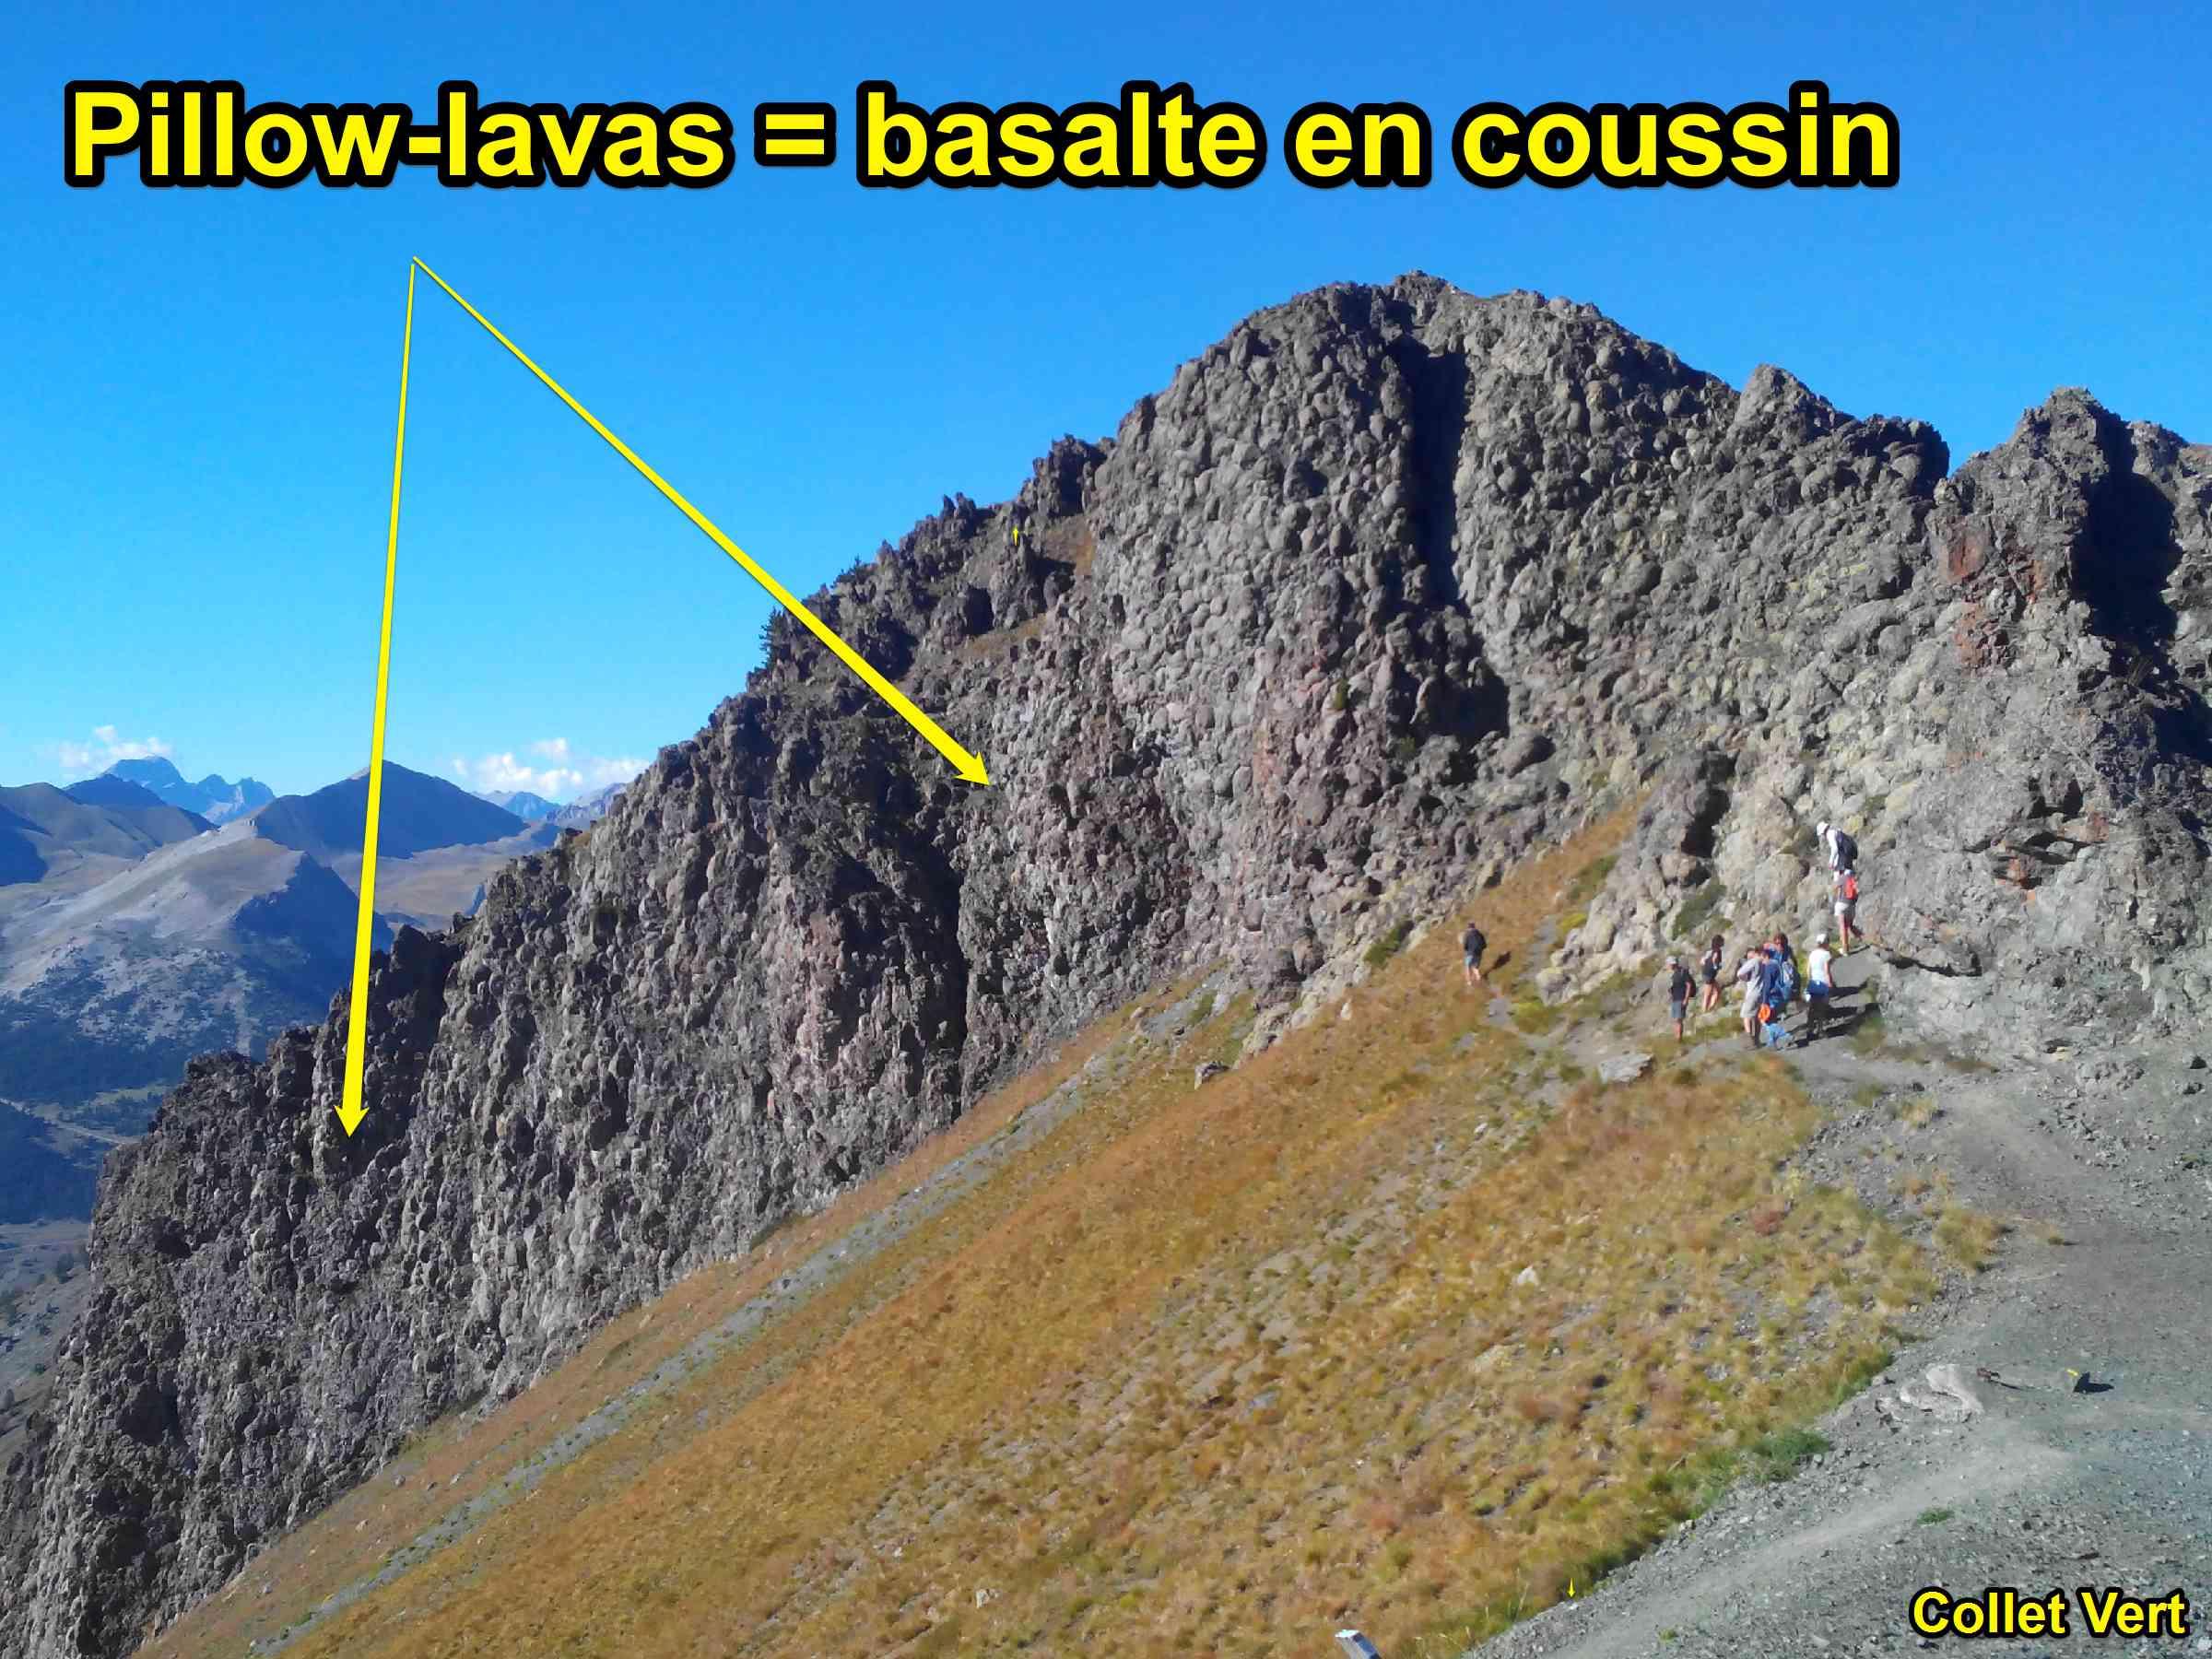 basalte en coussin pillow lava collet vert Alpes